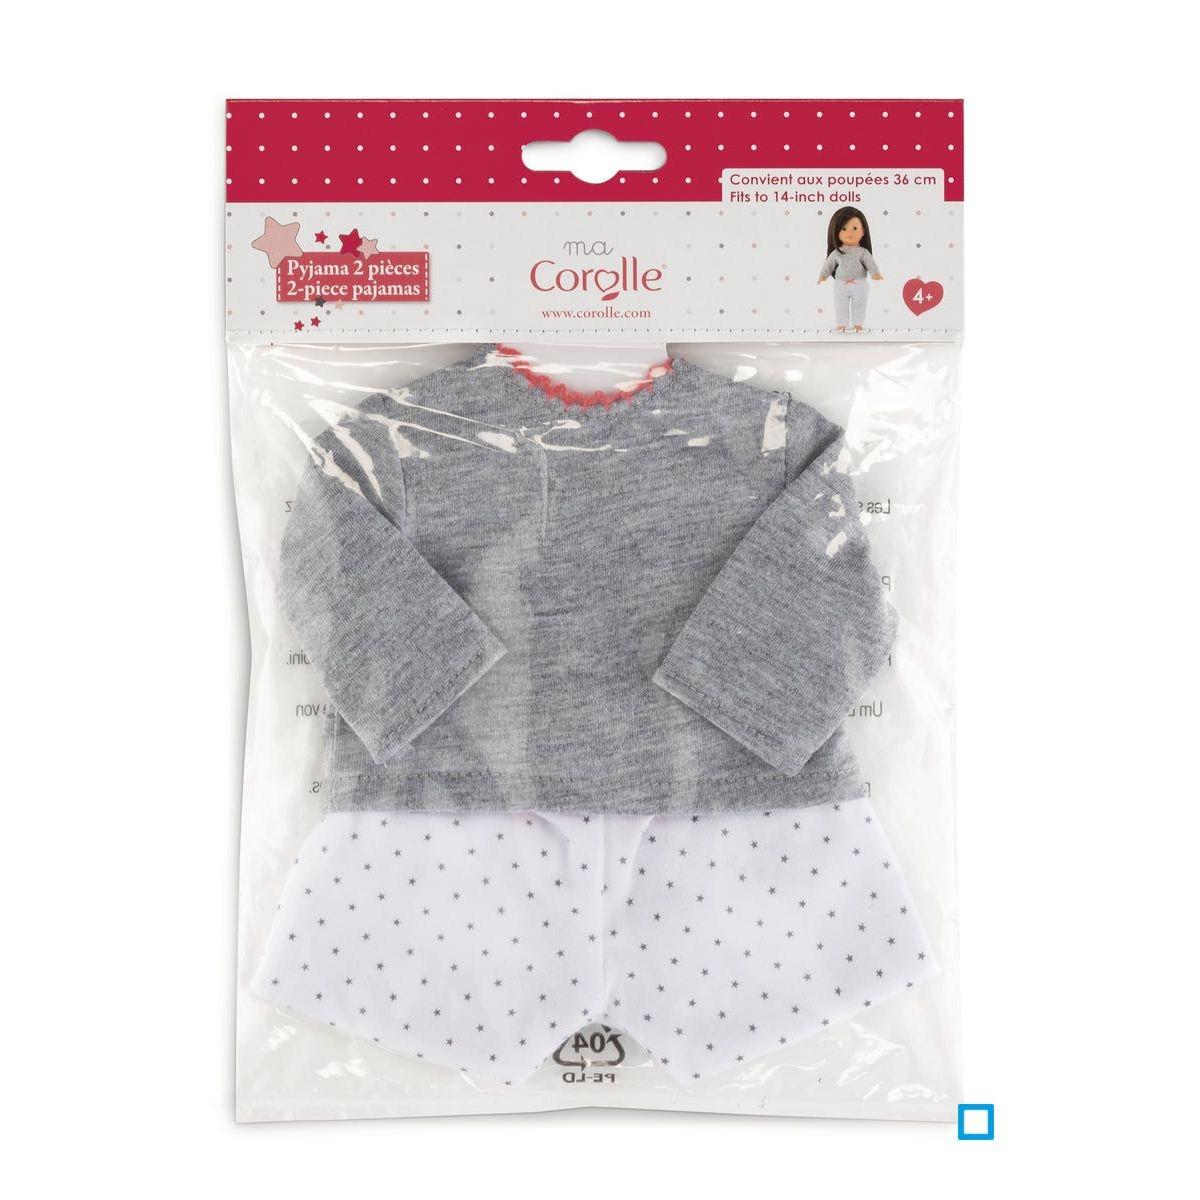 Pyjama 2 pièces pour poupée ma Corolle - CORDJH41